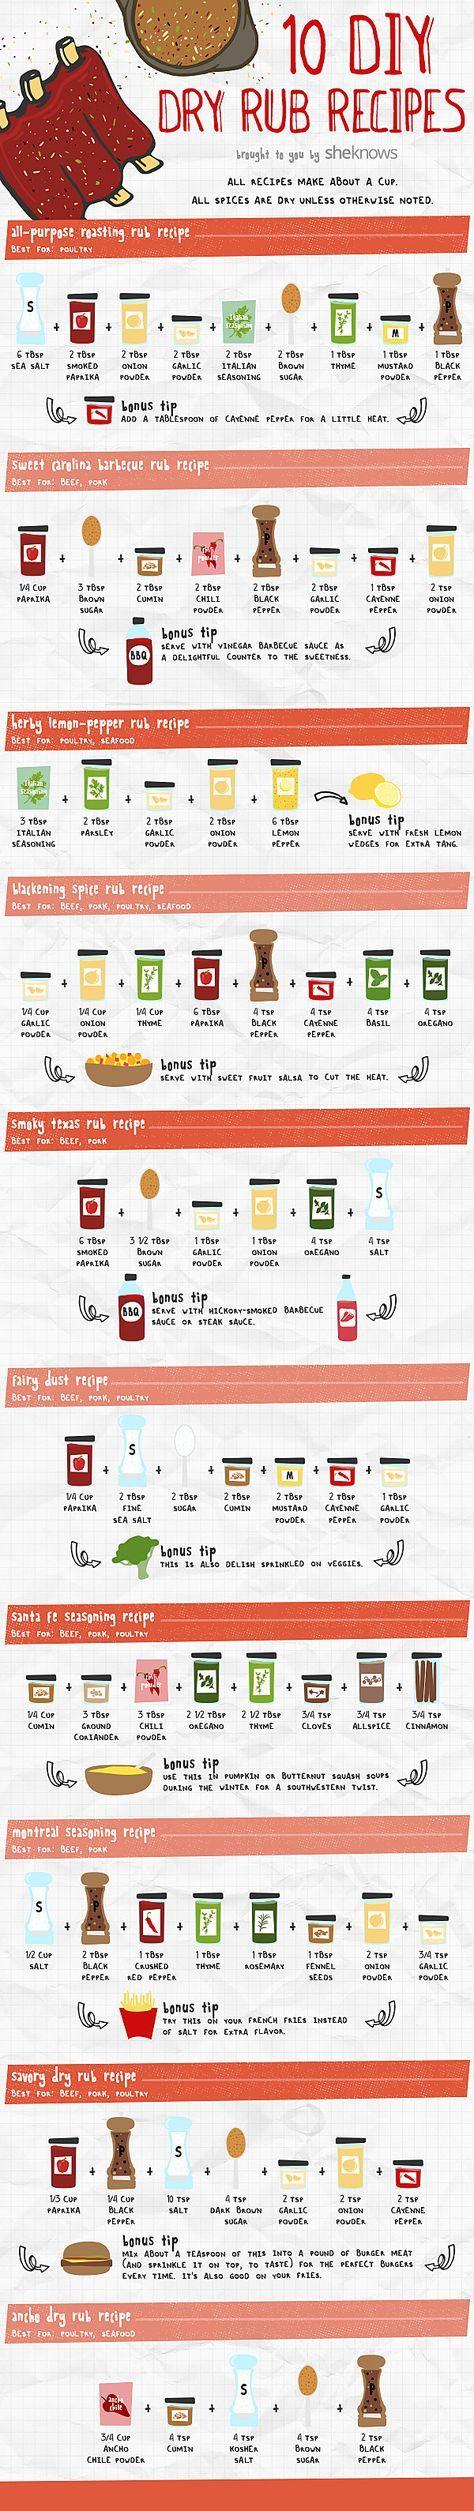 dry rub recipes infographic